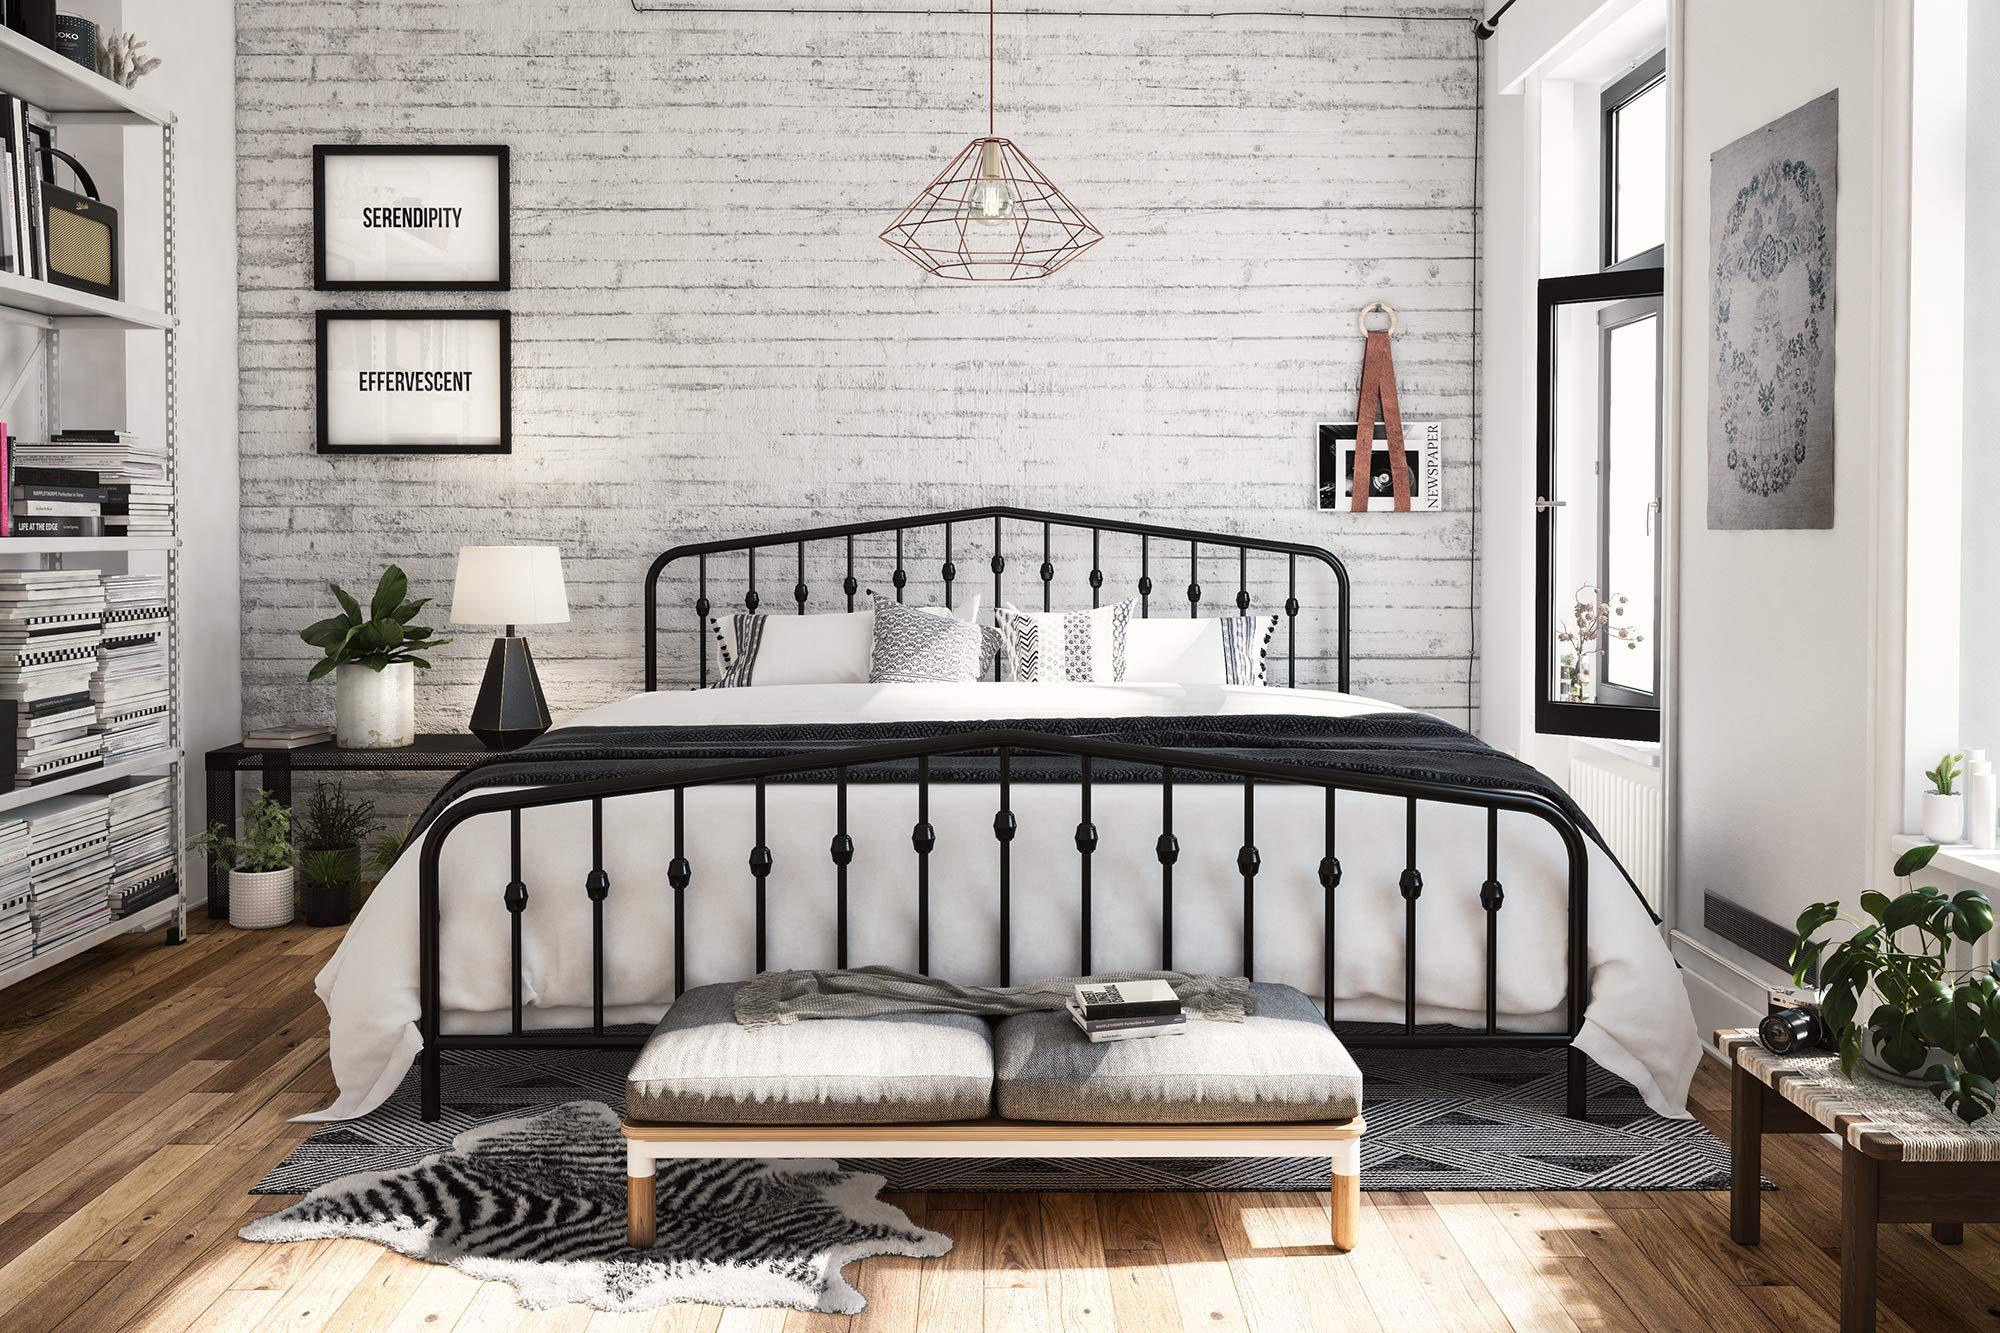 Novogratz 4044049N Bushwick Metal Bed, King, Black by Novogratz